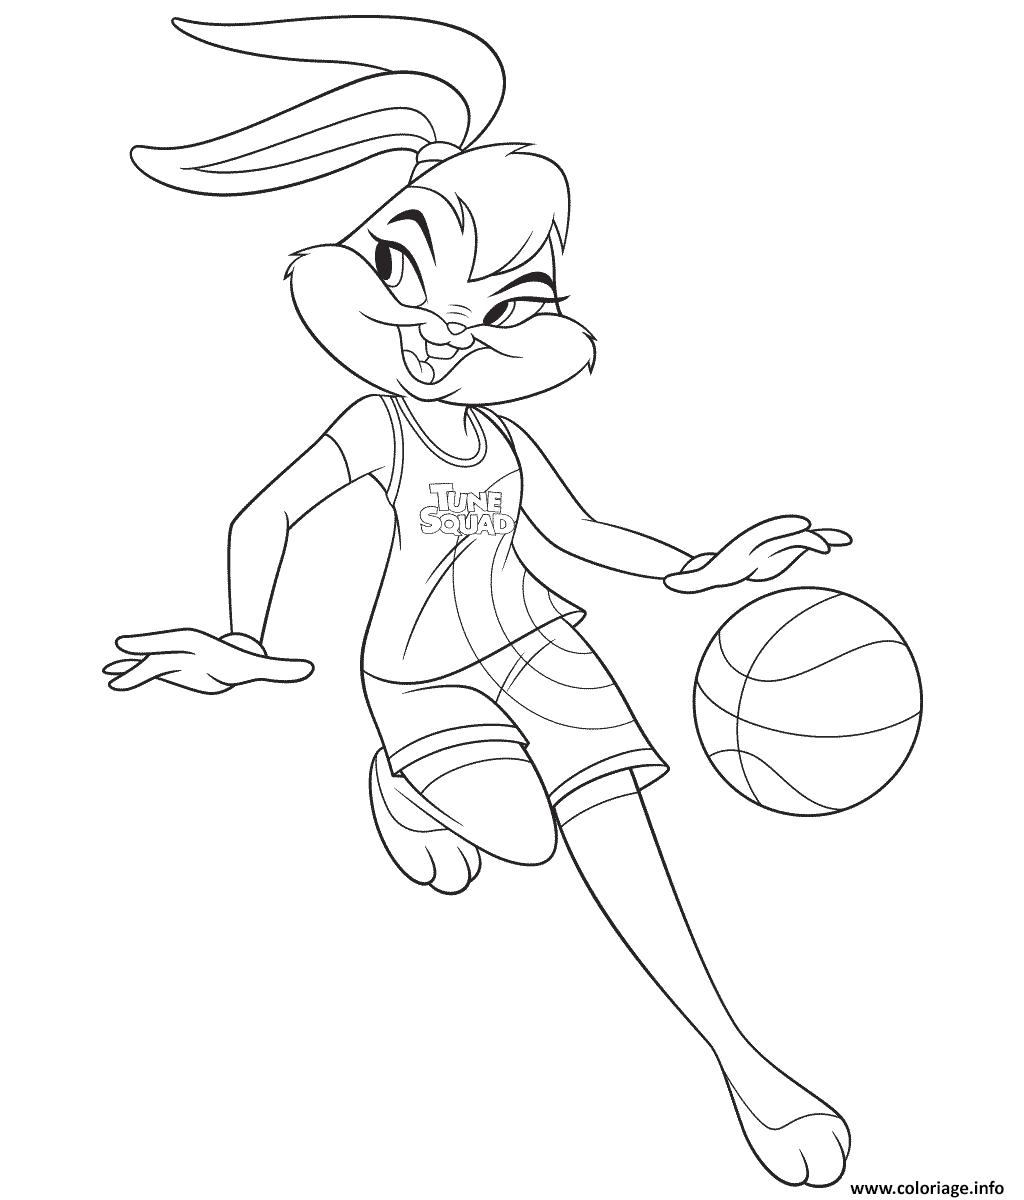 Dessin Lola Bunny Coloriage Gratuit à Imprimer